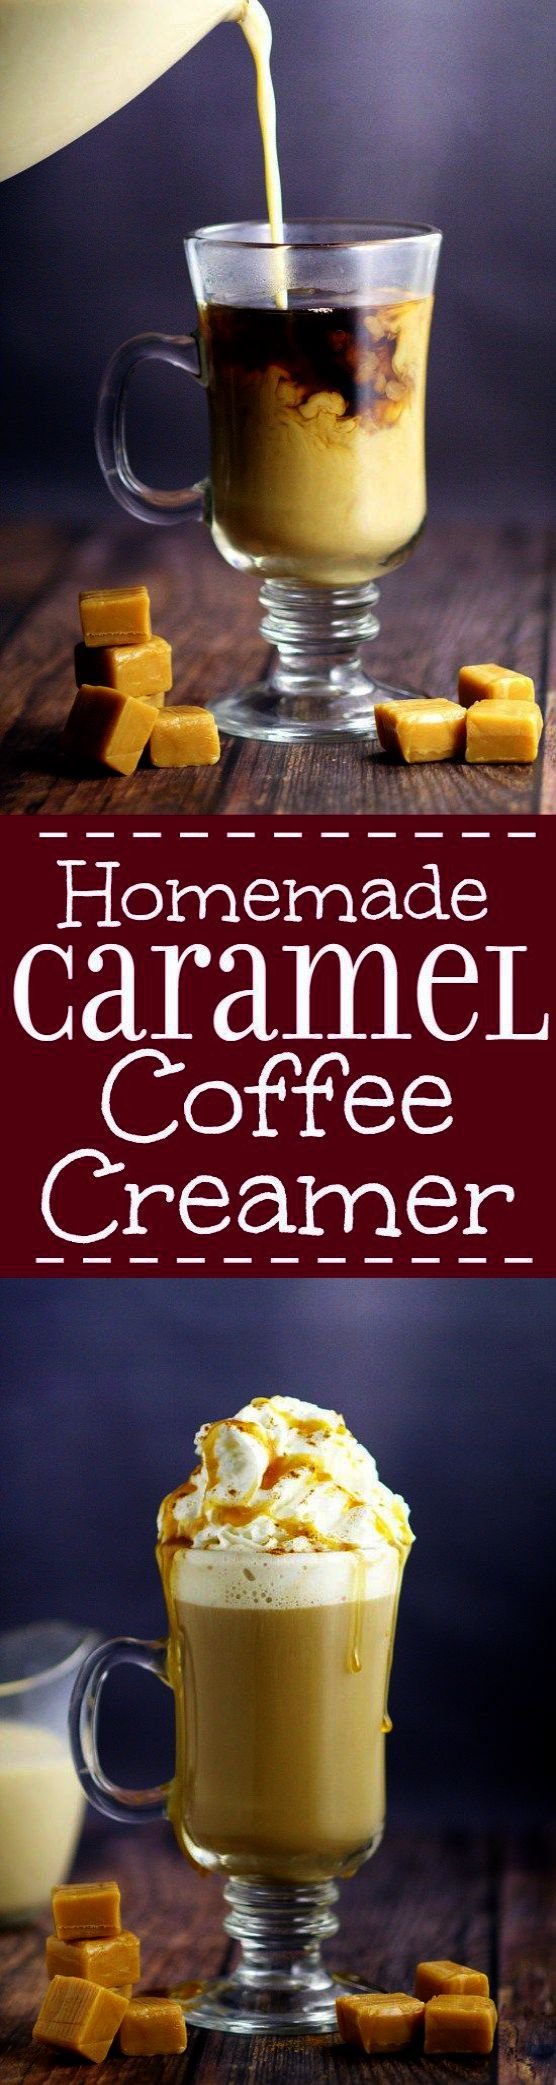 Coffee Near Me Berkeley Coffee Maker In Spanish Off Coffee Meets Bagel Examples Coffee Republic Amid Co Caramel Coffee Homemade Caramel Coffee Creamer Recipe